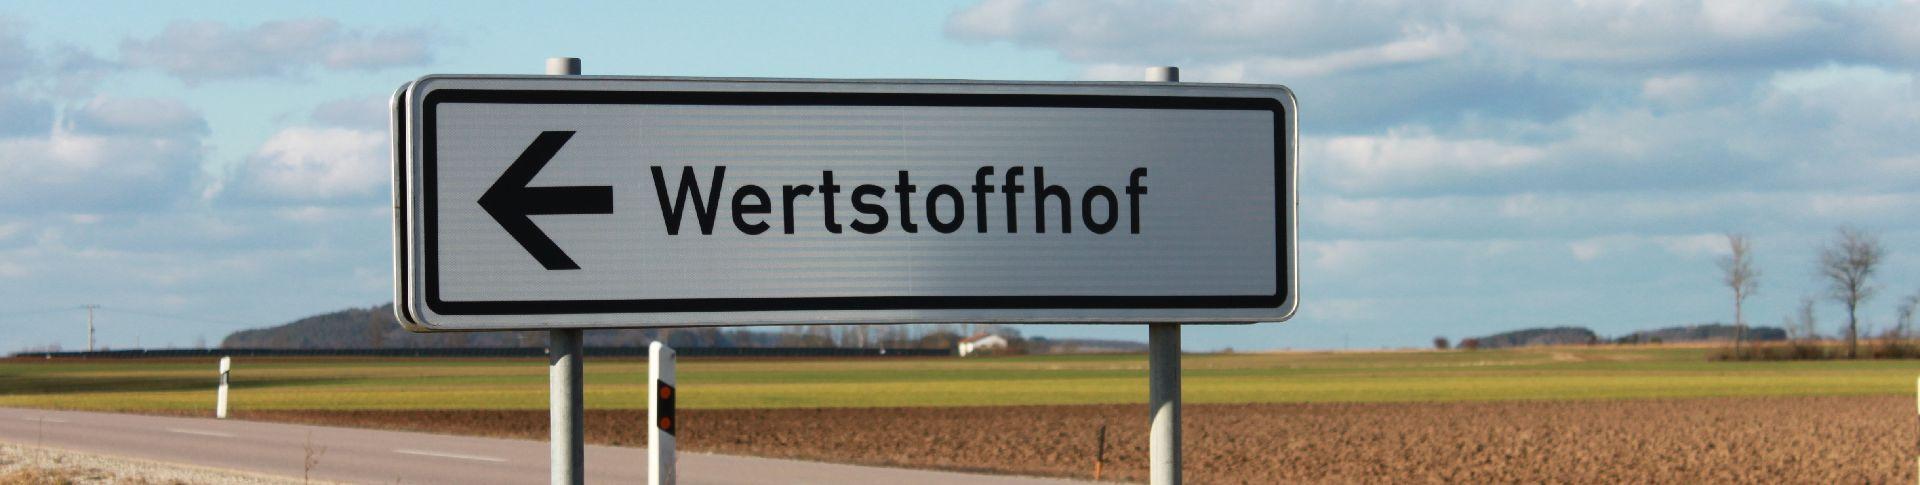 Wertstoffhof